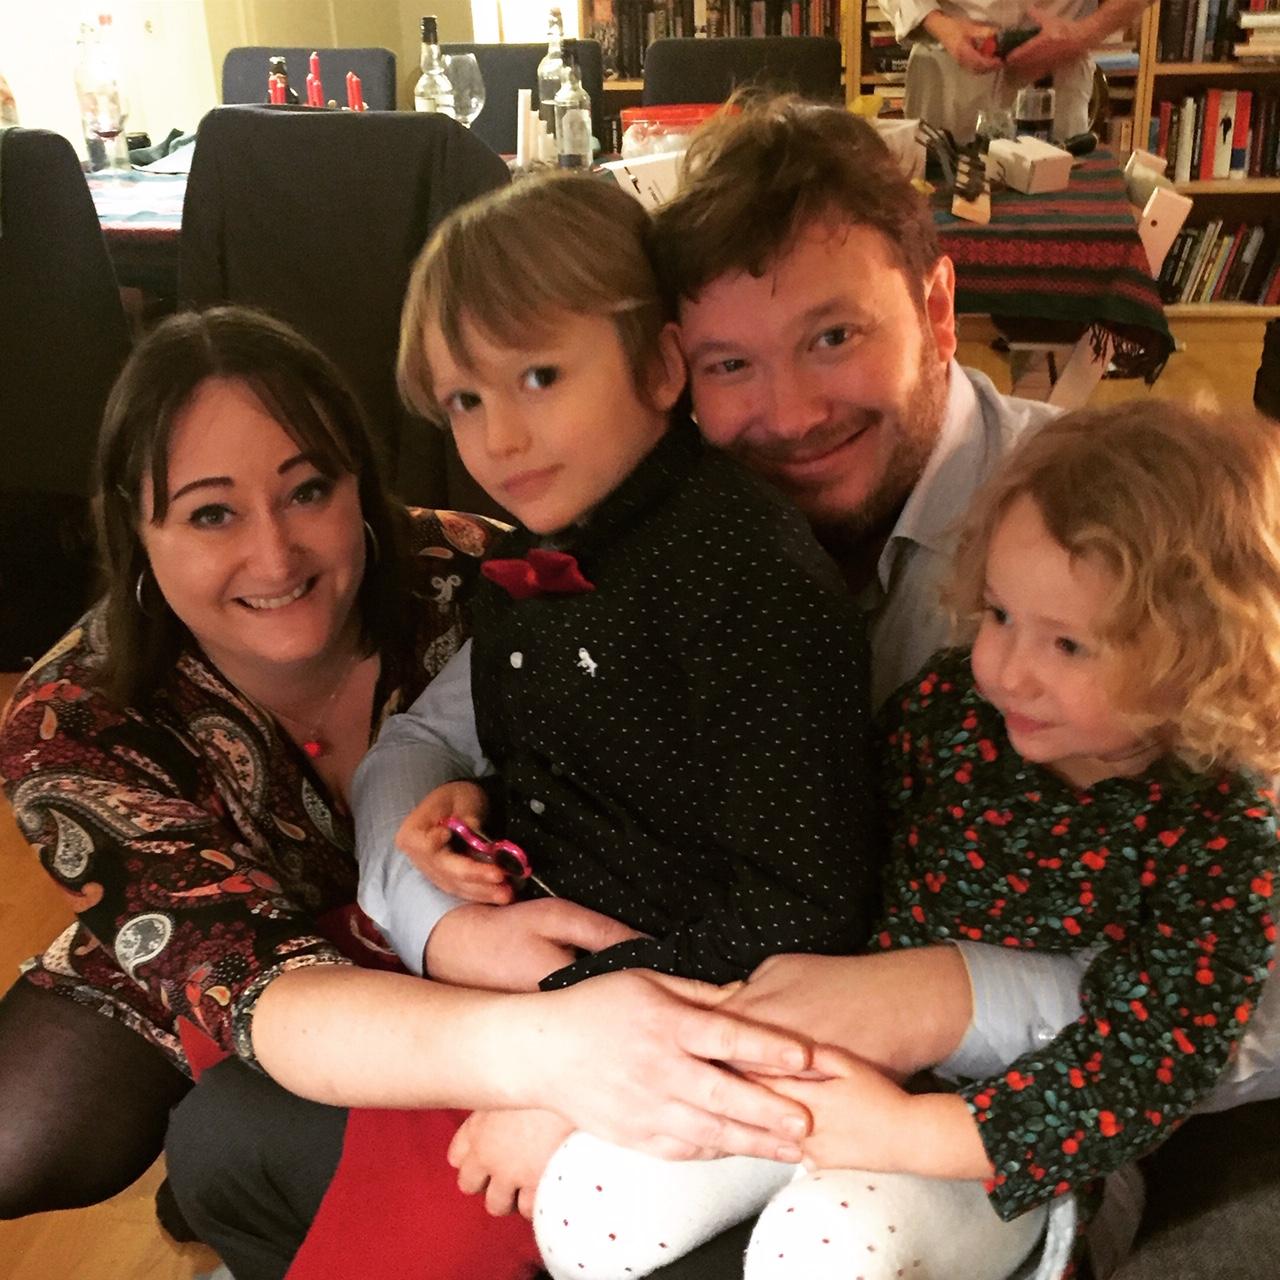 Hela familjen Lager-Ericson. Julafton 2018.